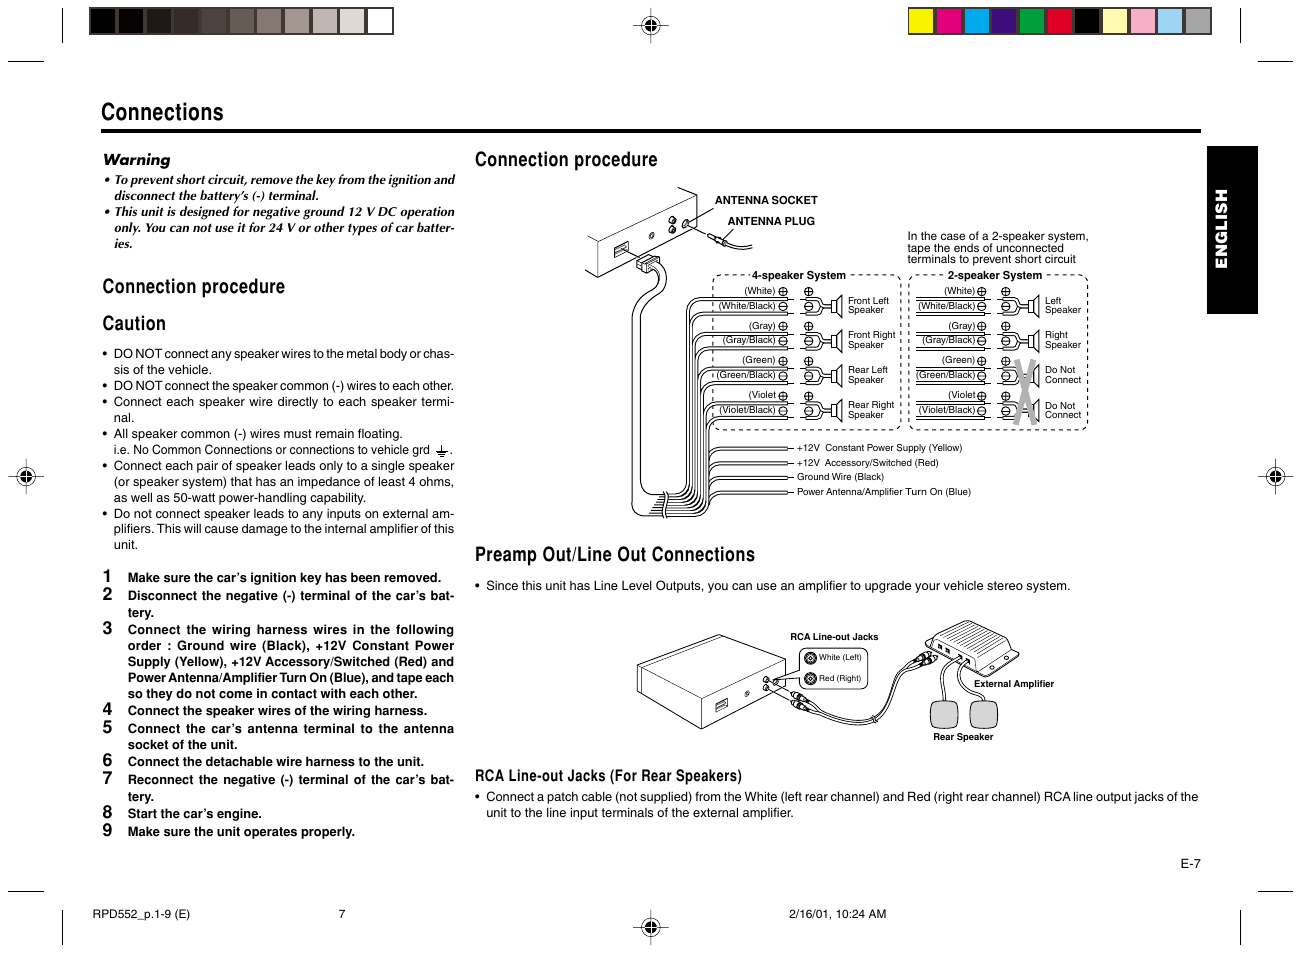 blaupunkt rpd 552 page8?resize\\\=665%2C487 blaupunkt wiring diagram tamahuproject org blaupunkt 520 u1e wiring diagram at n-0.co